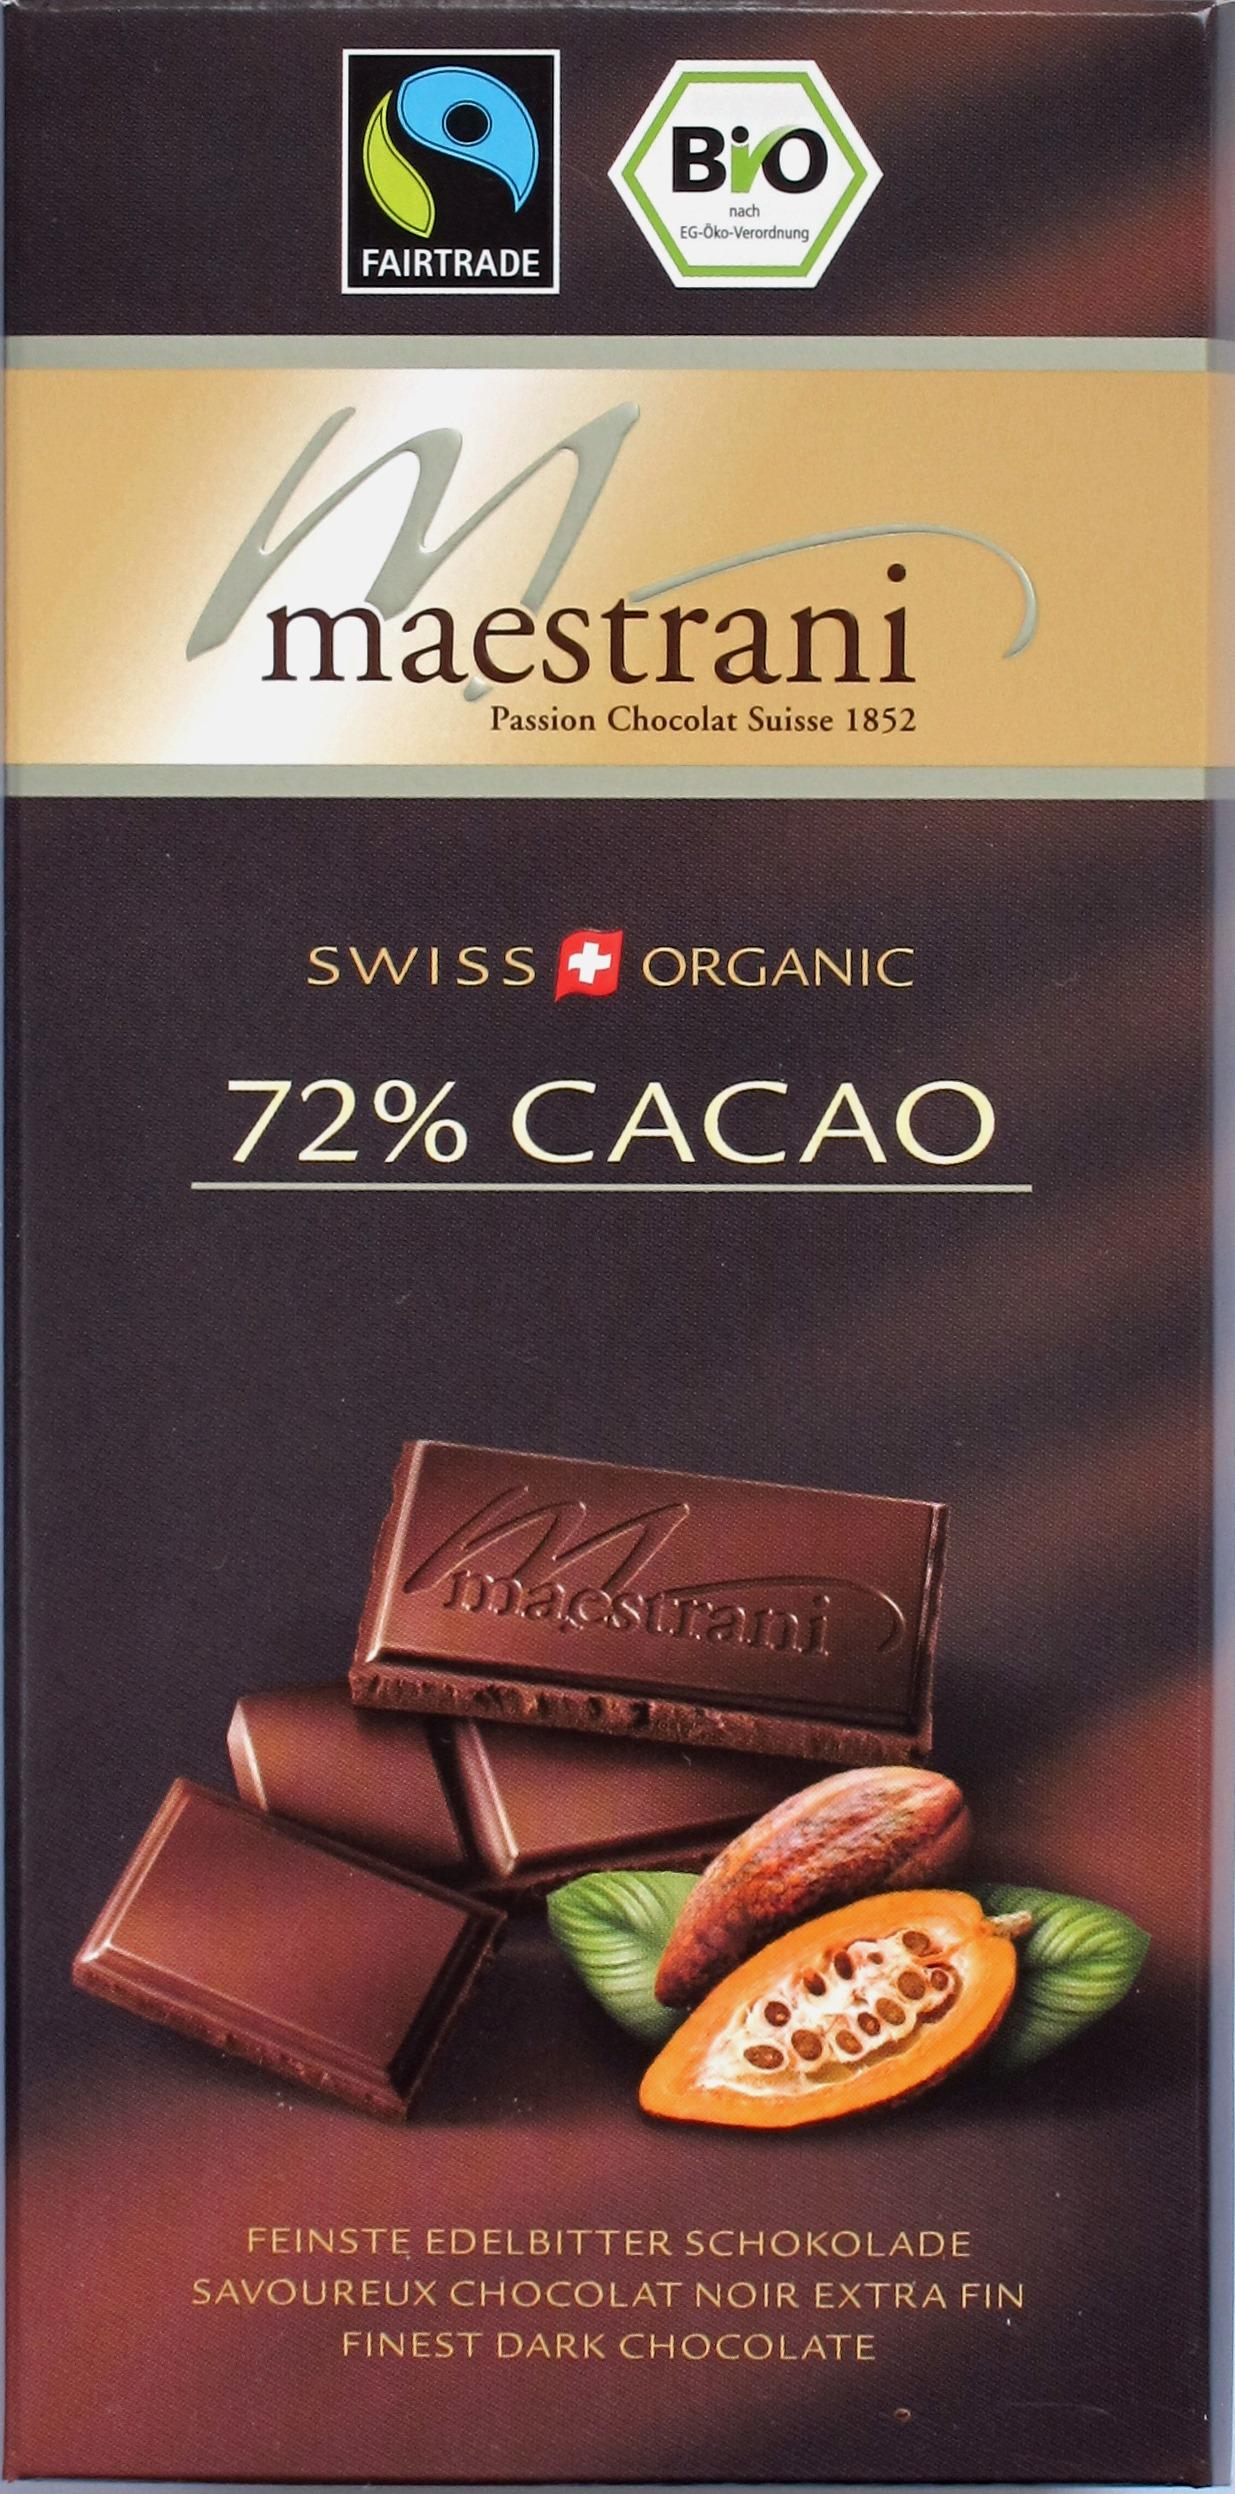 "Maestrani-Fairtrade- und Bio-Schokolade ""72% Cacao"""